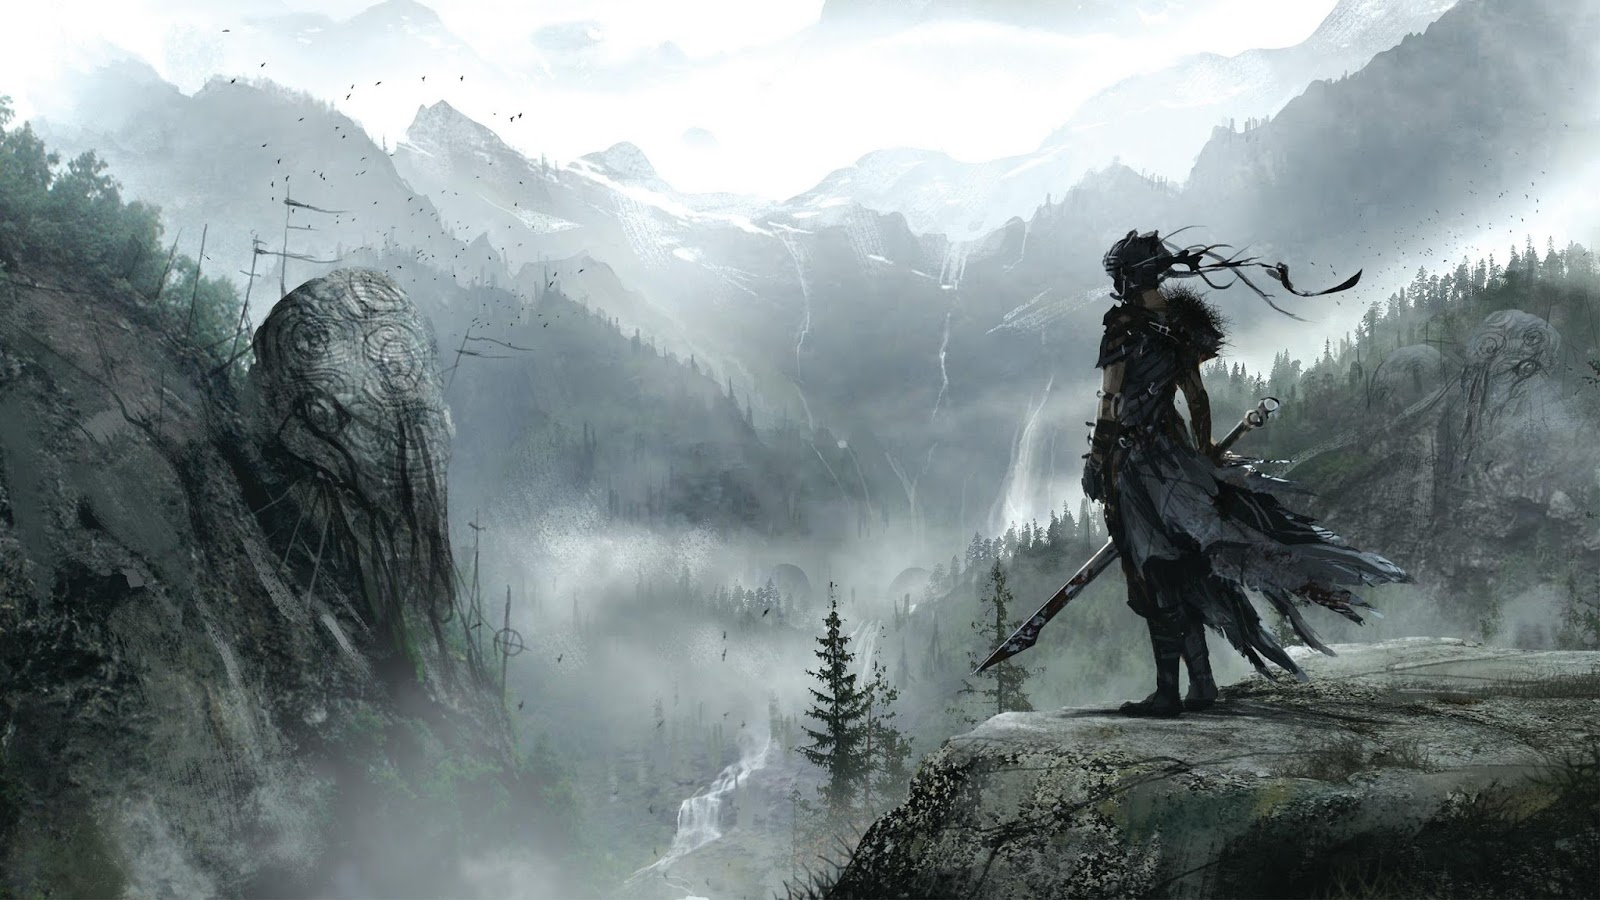 Stunning Hd Fantasy Gaming Desktop Wallpapers: Ultra HD Games Wallpapers For Desktop